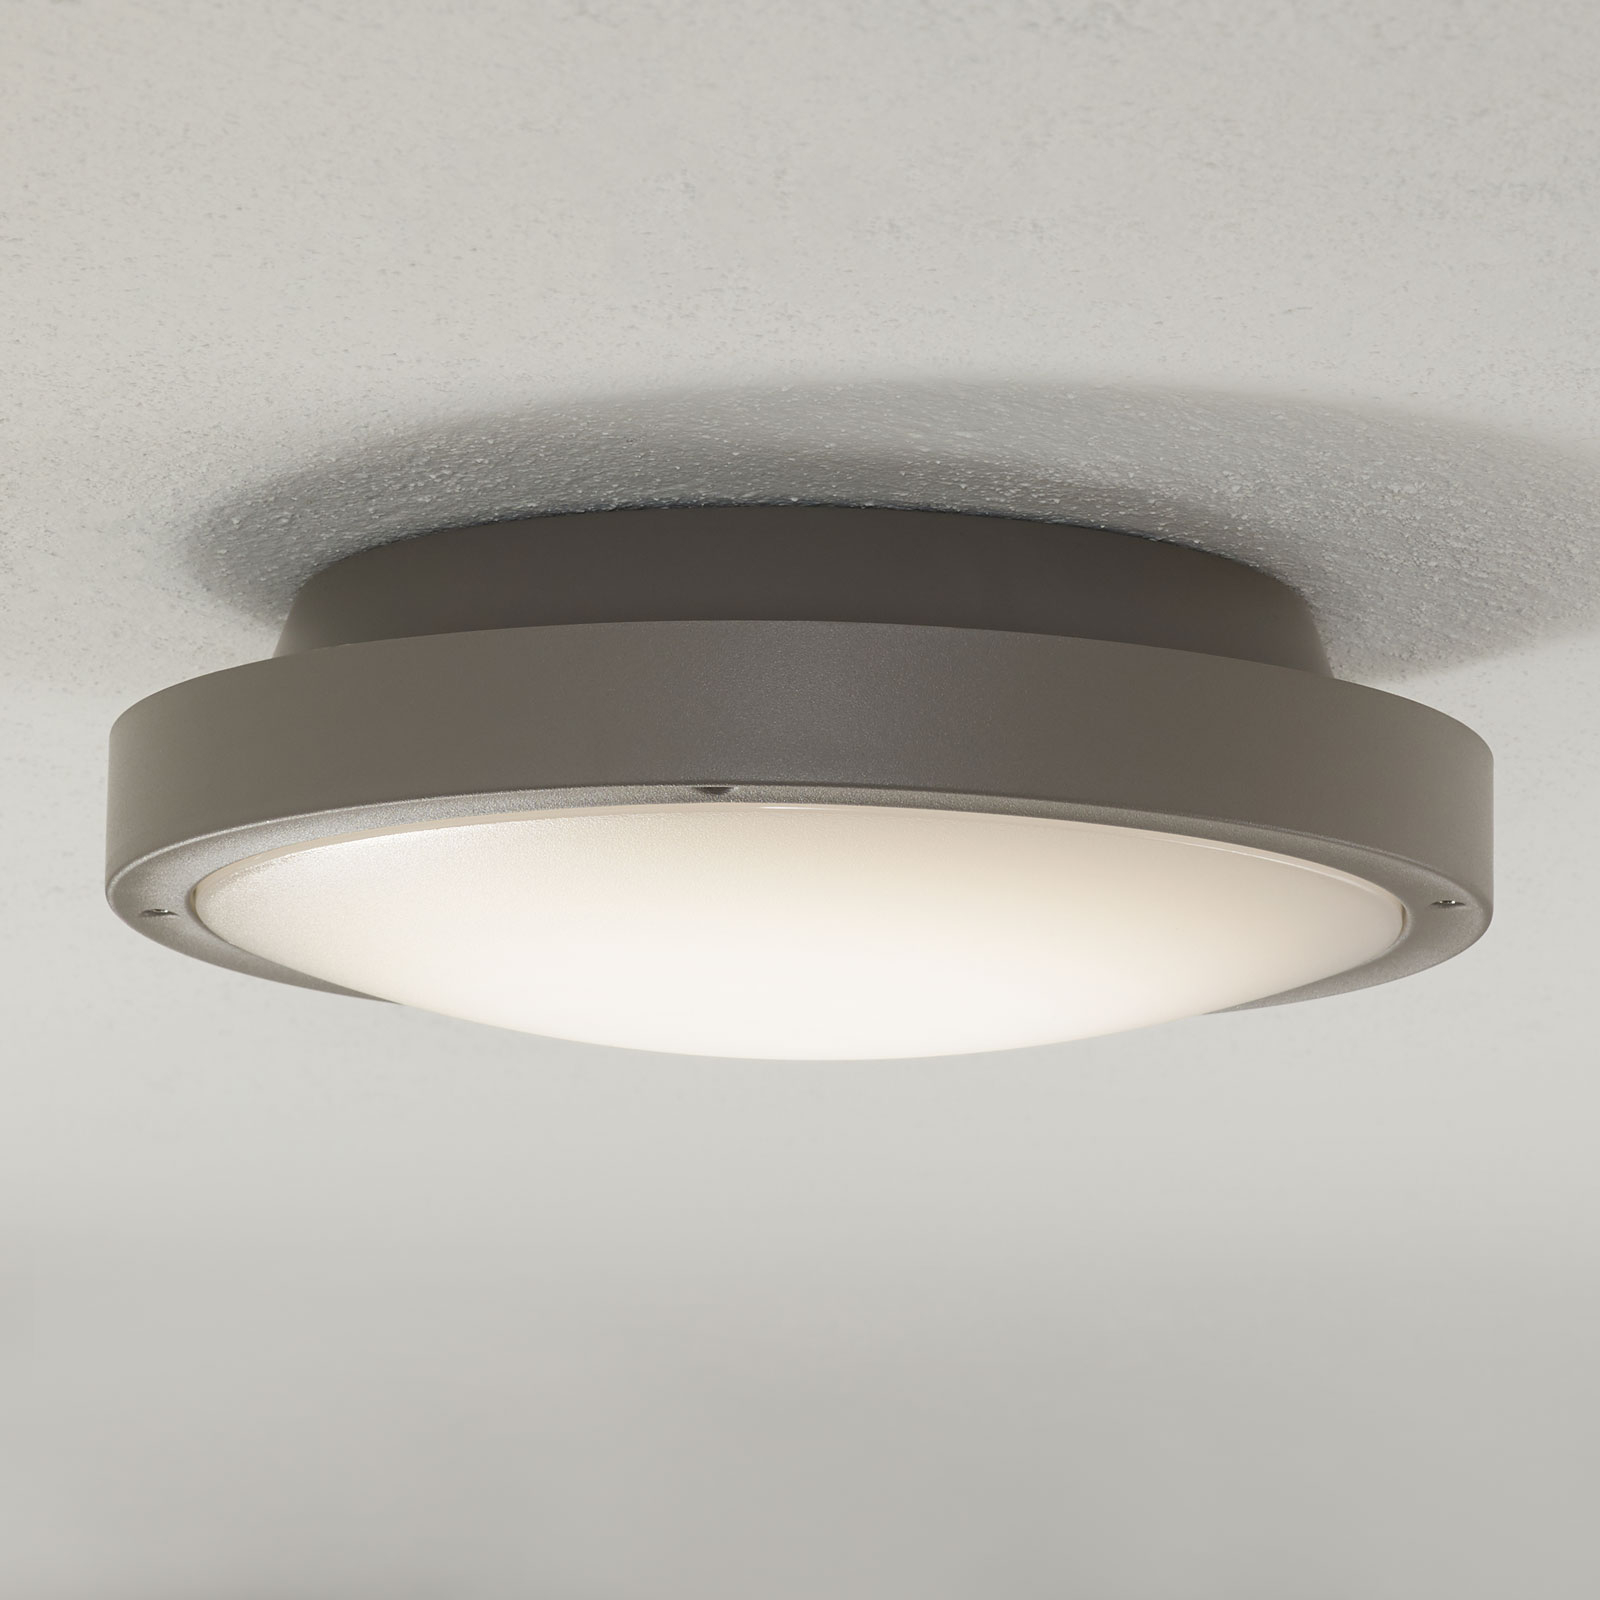 Arcchio Benian LED plafondlamp 4.000 K